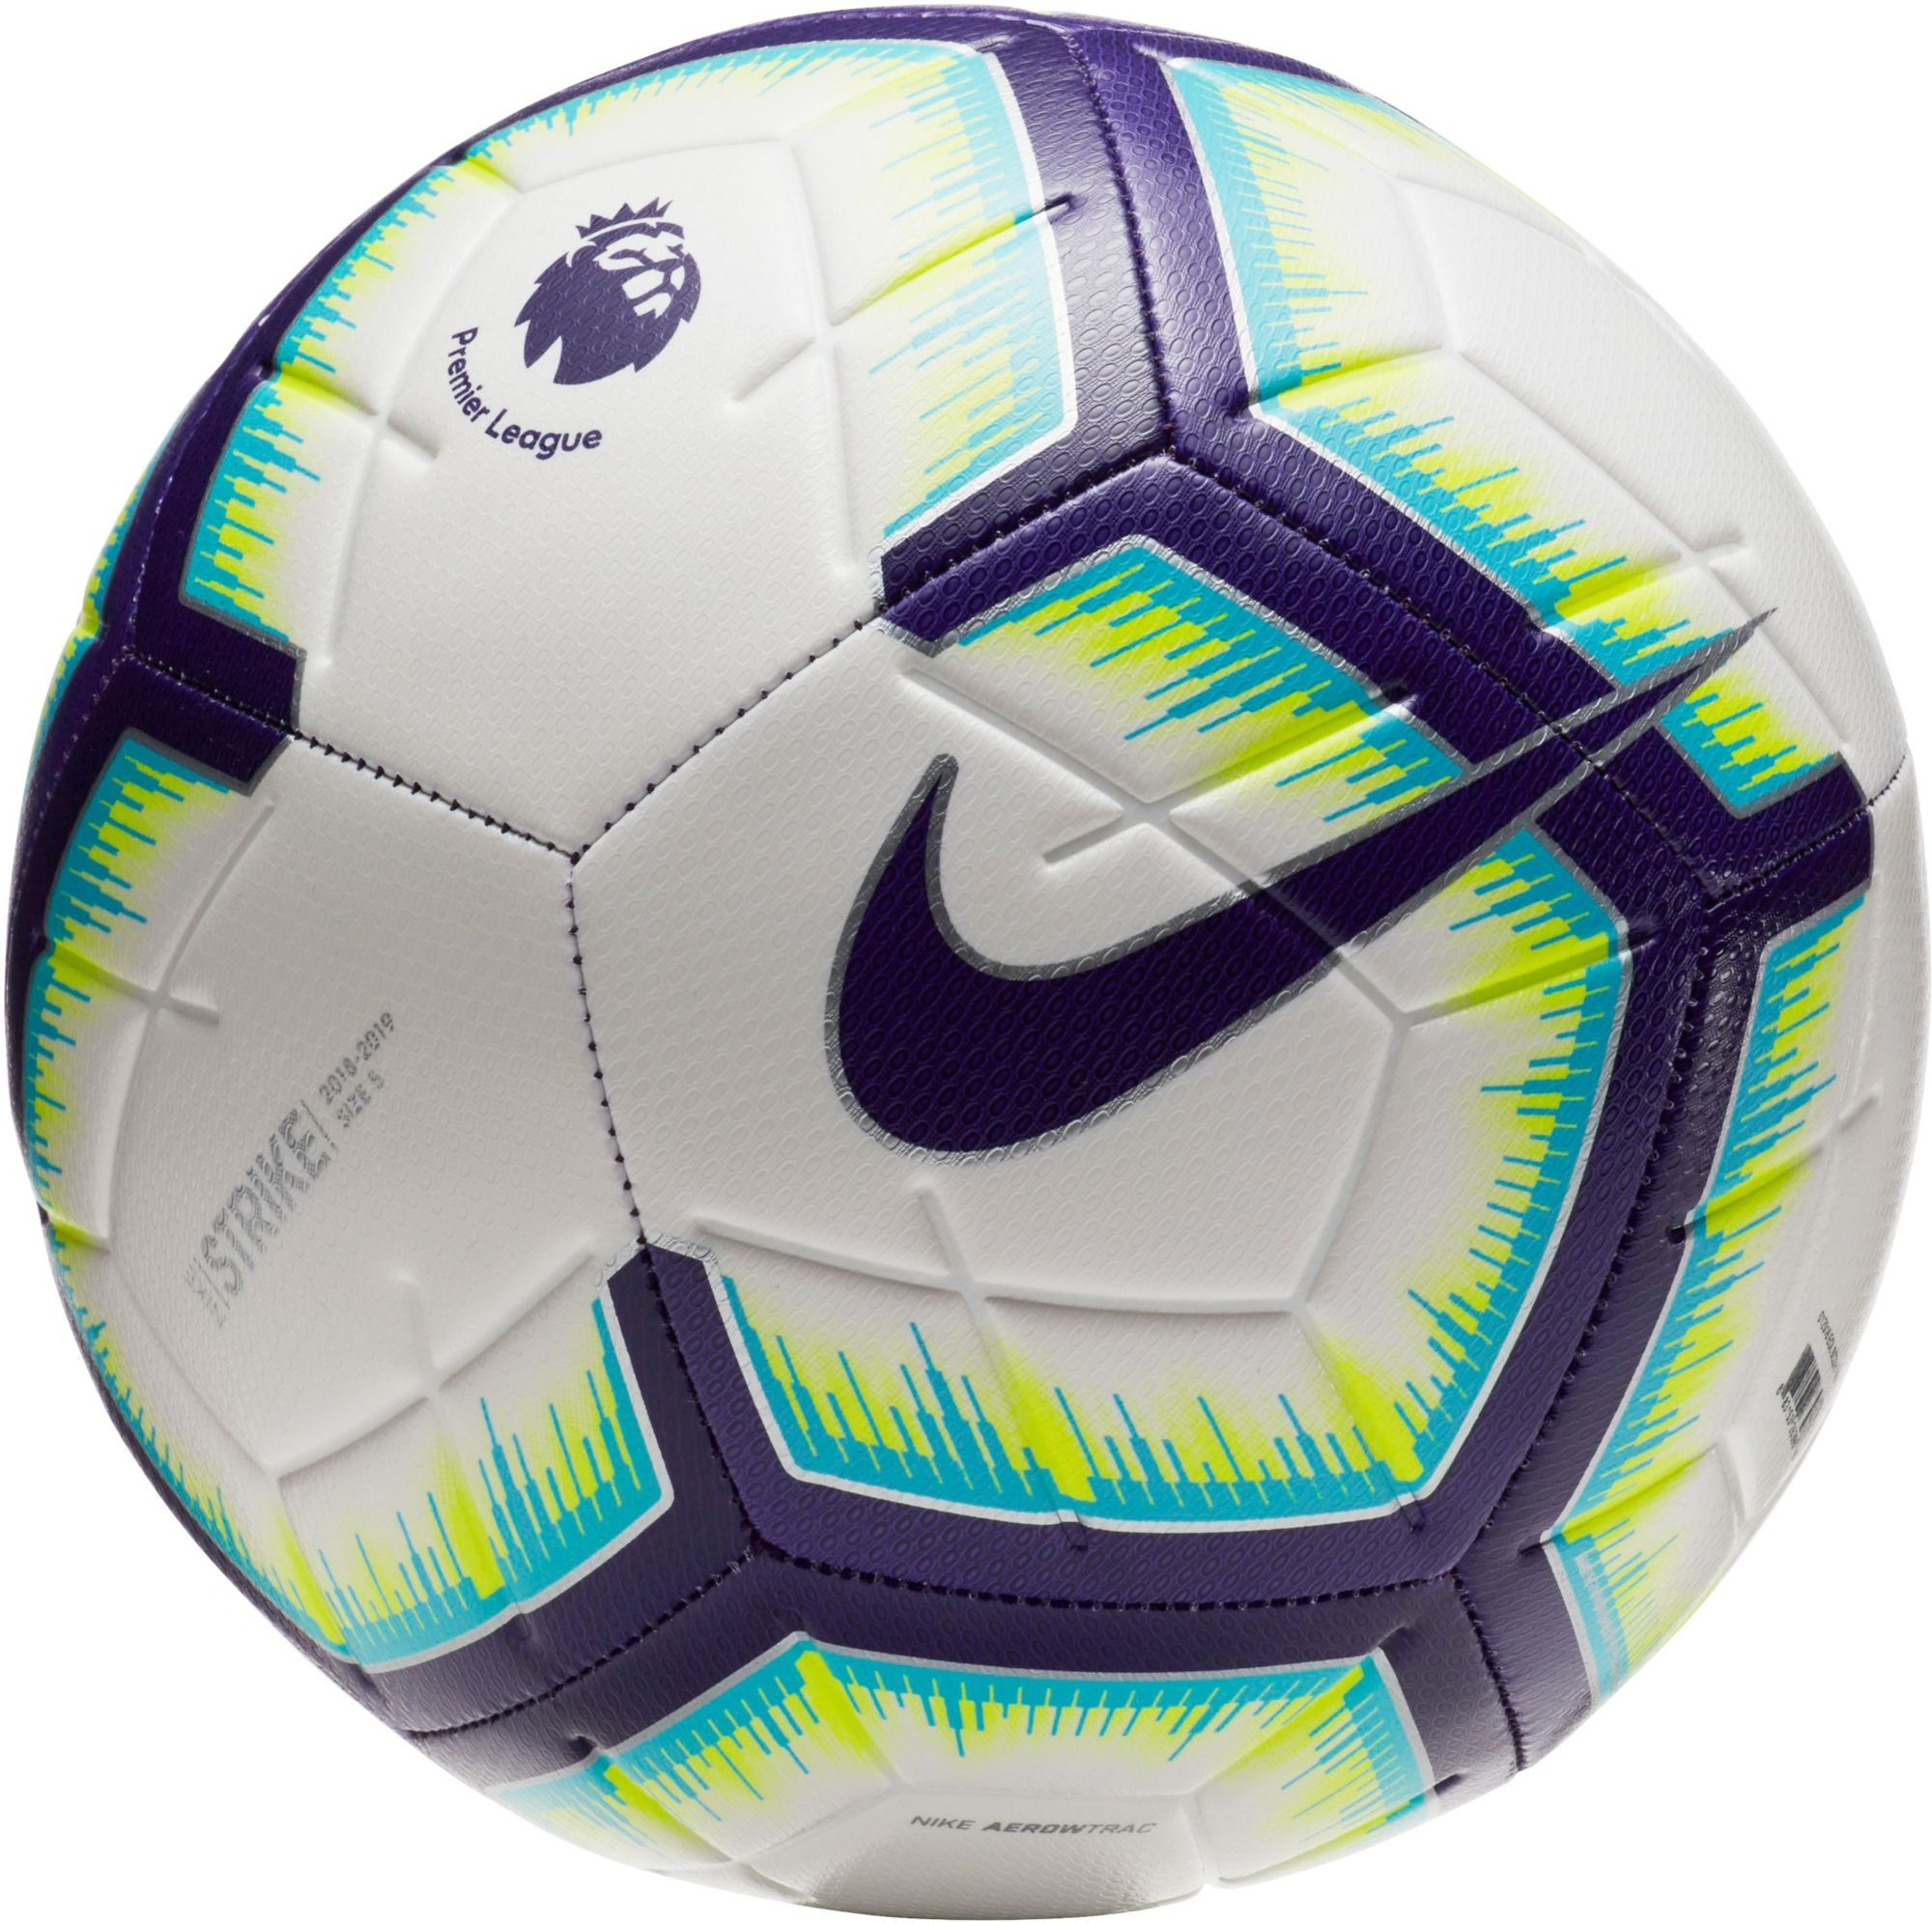 Nike Premier League Strike Soccer Ball White In 2020 Nike Soccer Ball Soccer Ball Soccer Balls